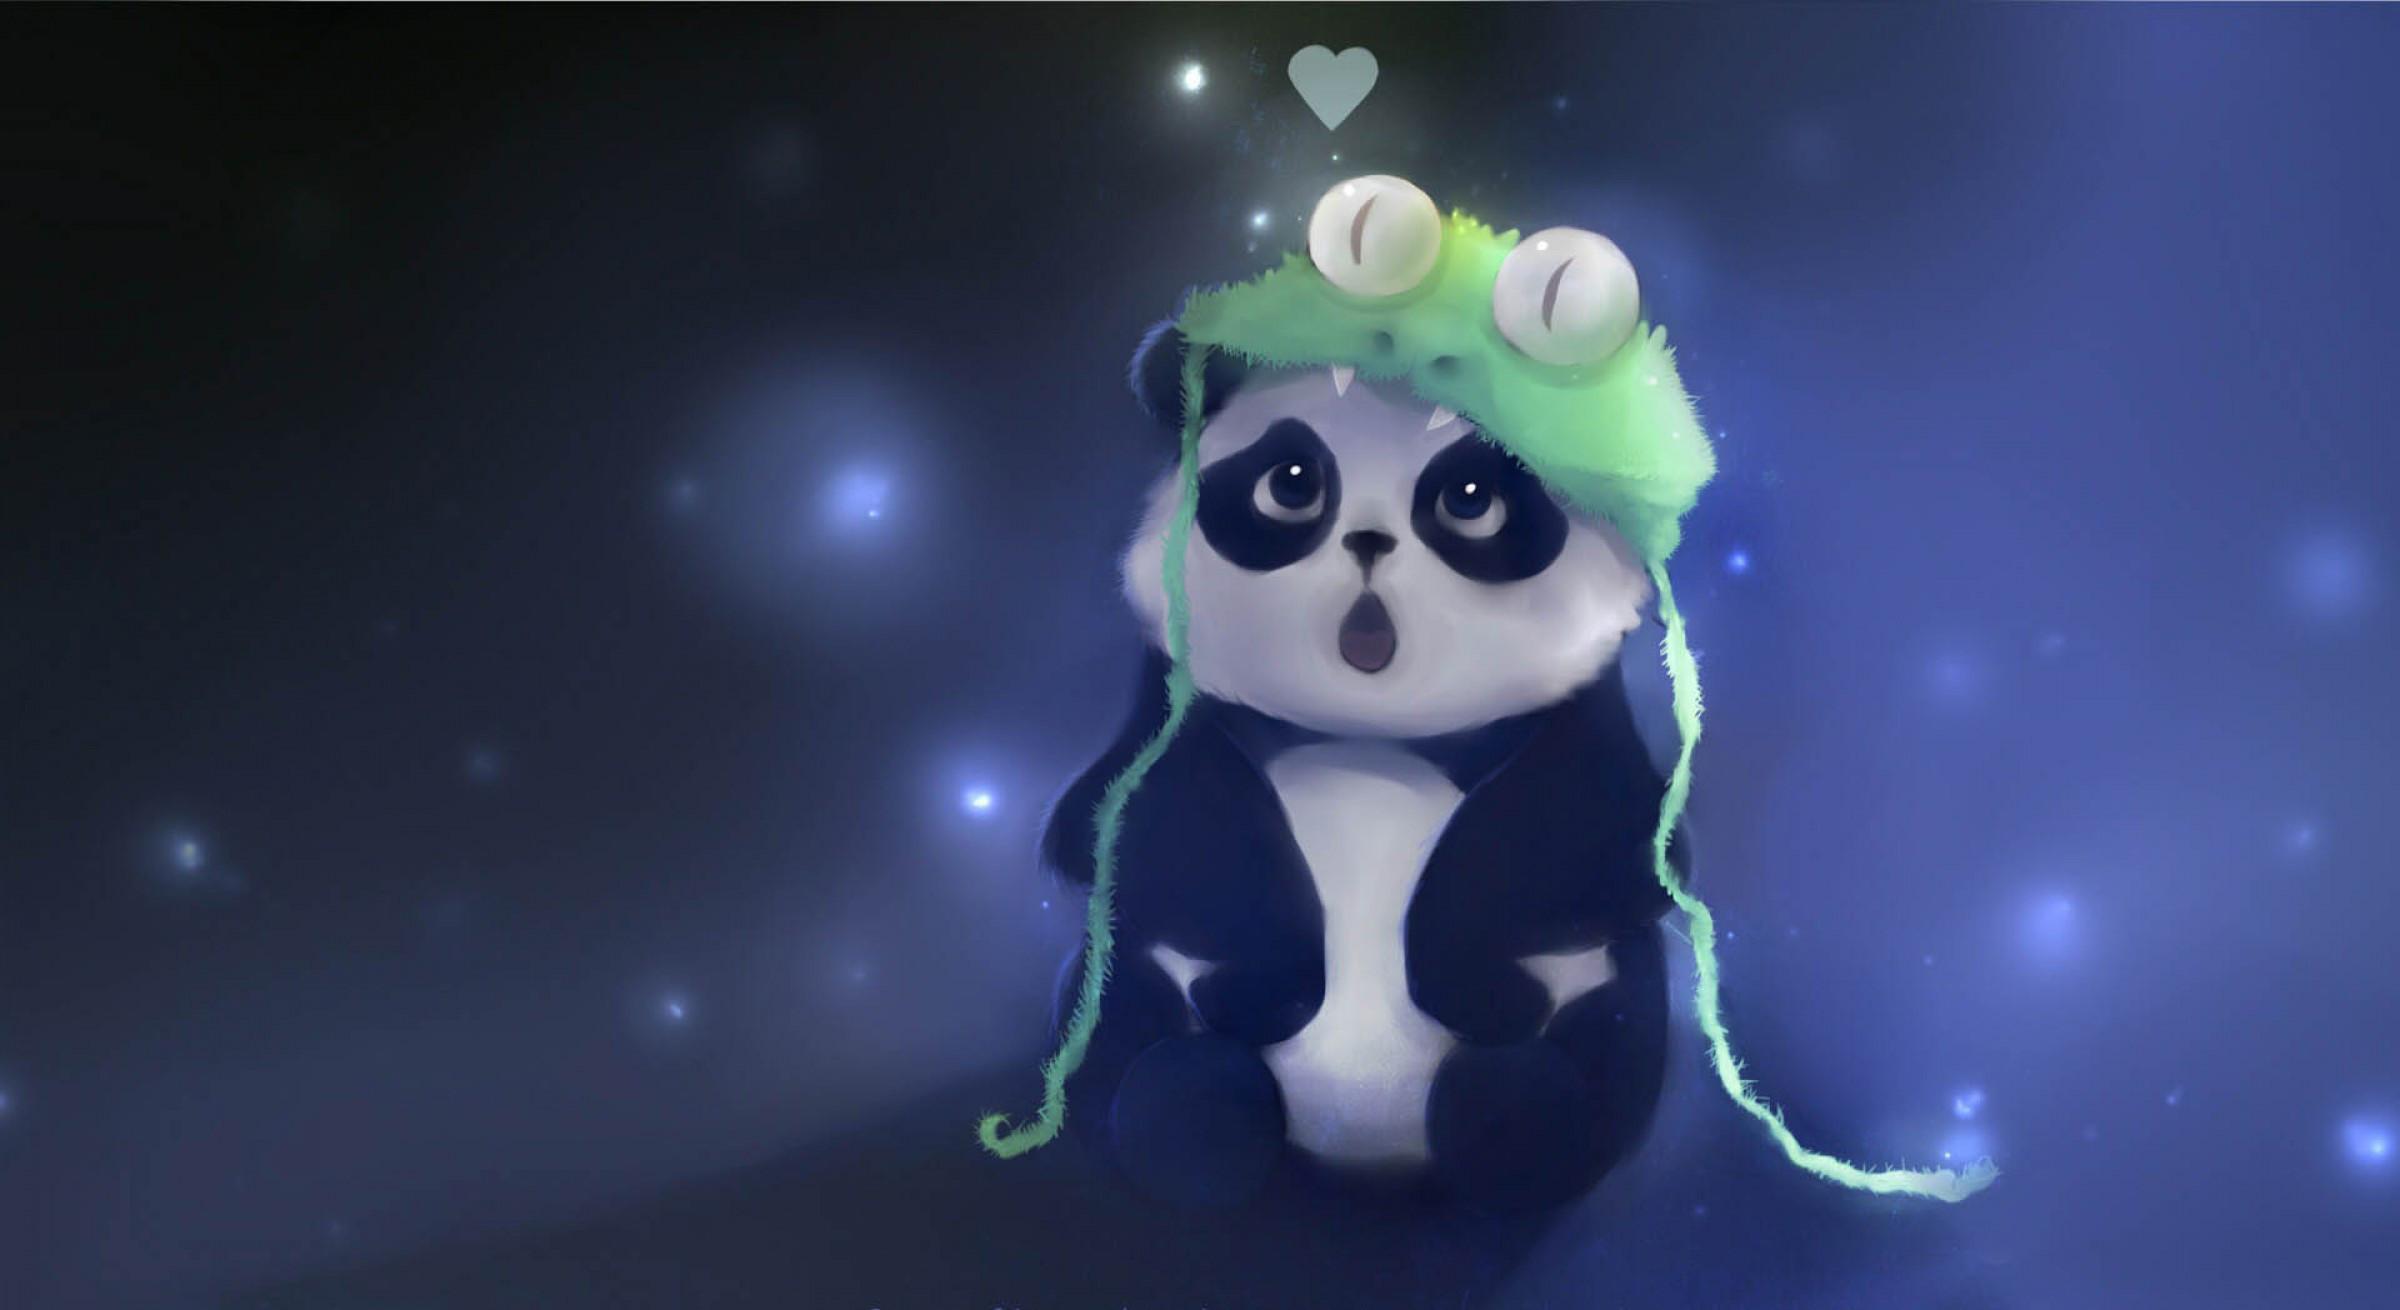 Res: 2400x1310, Anime Panda #1743252